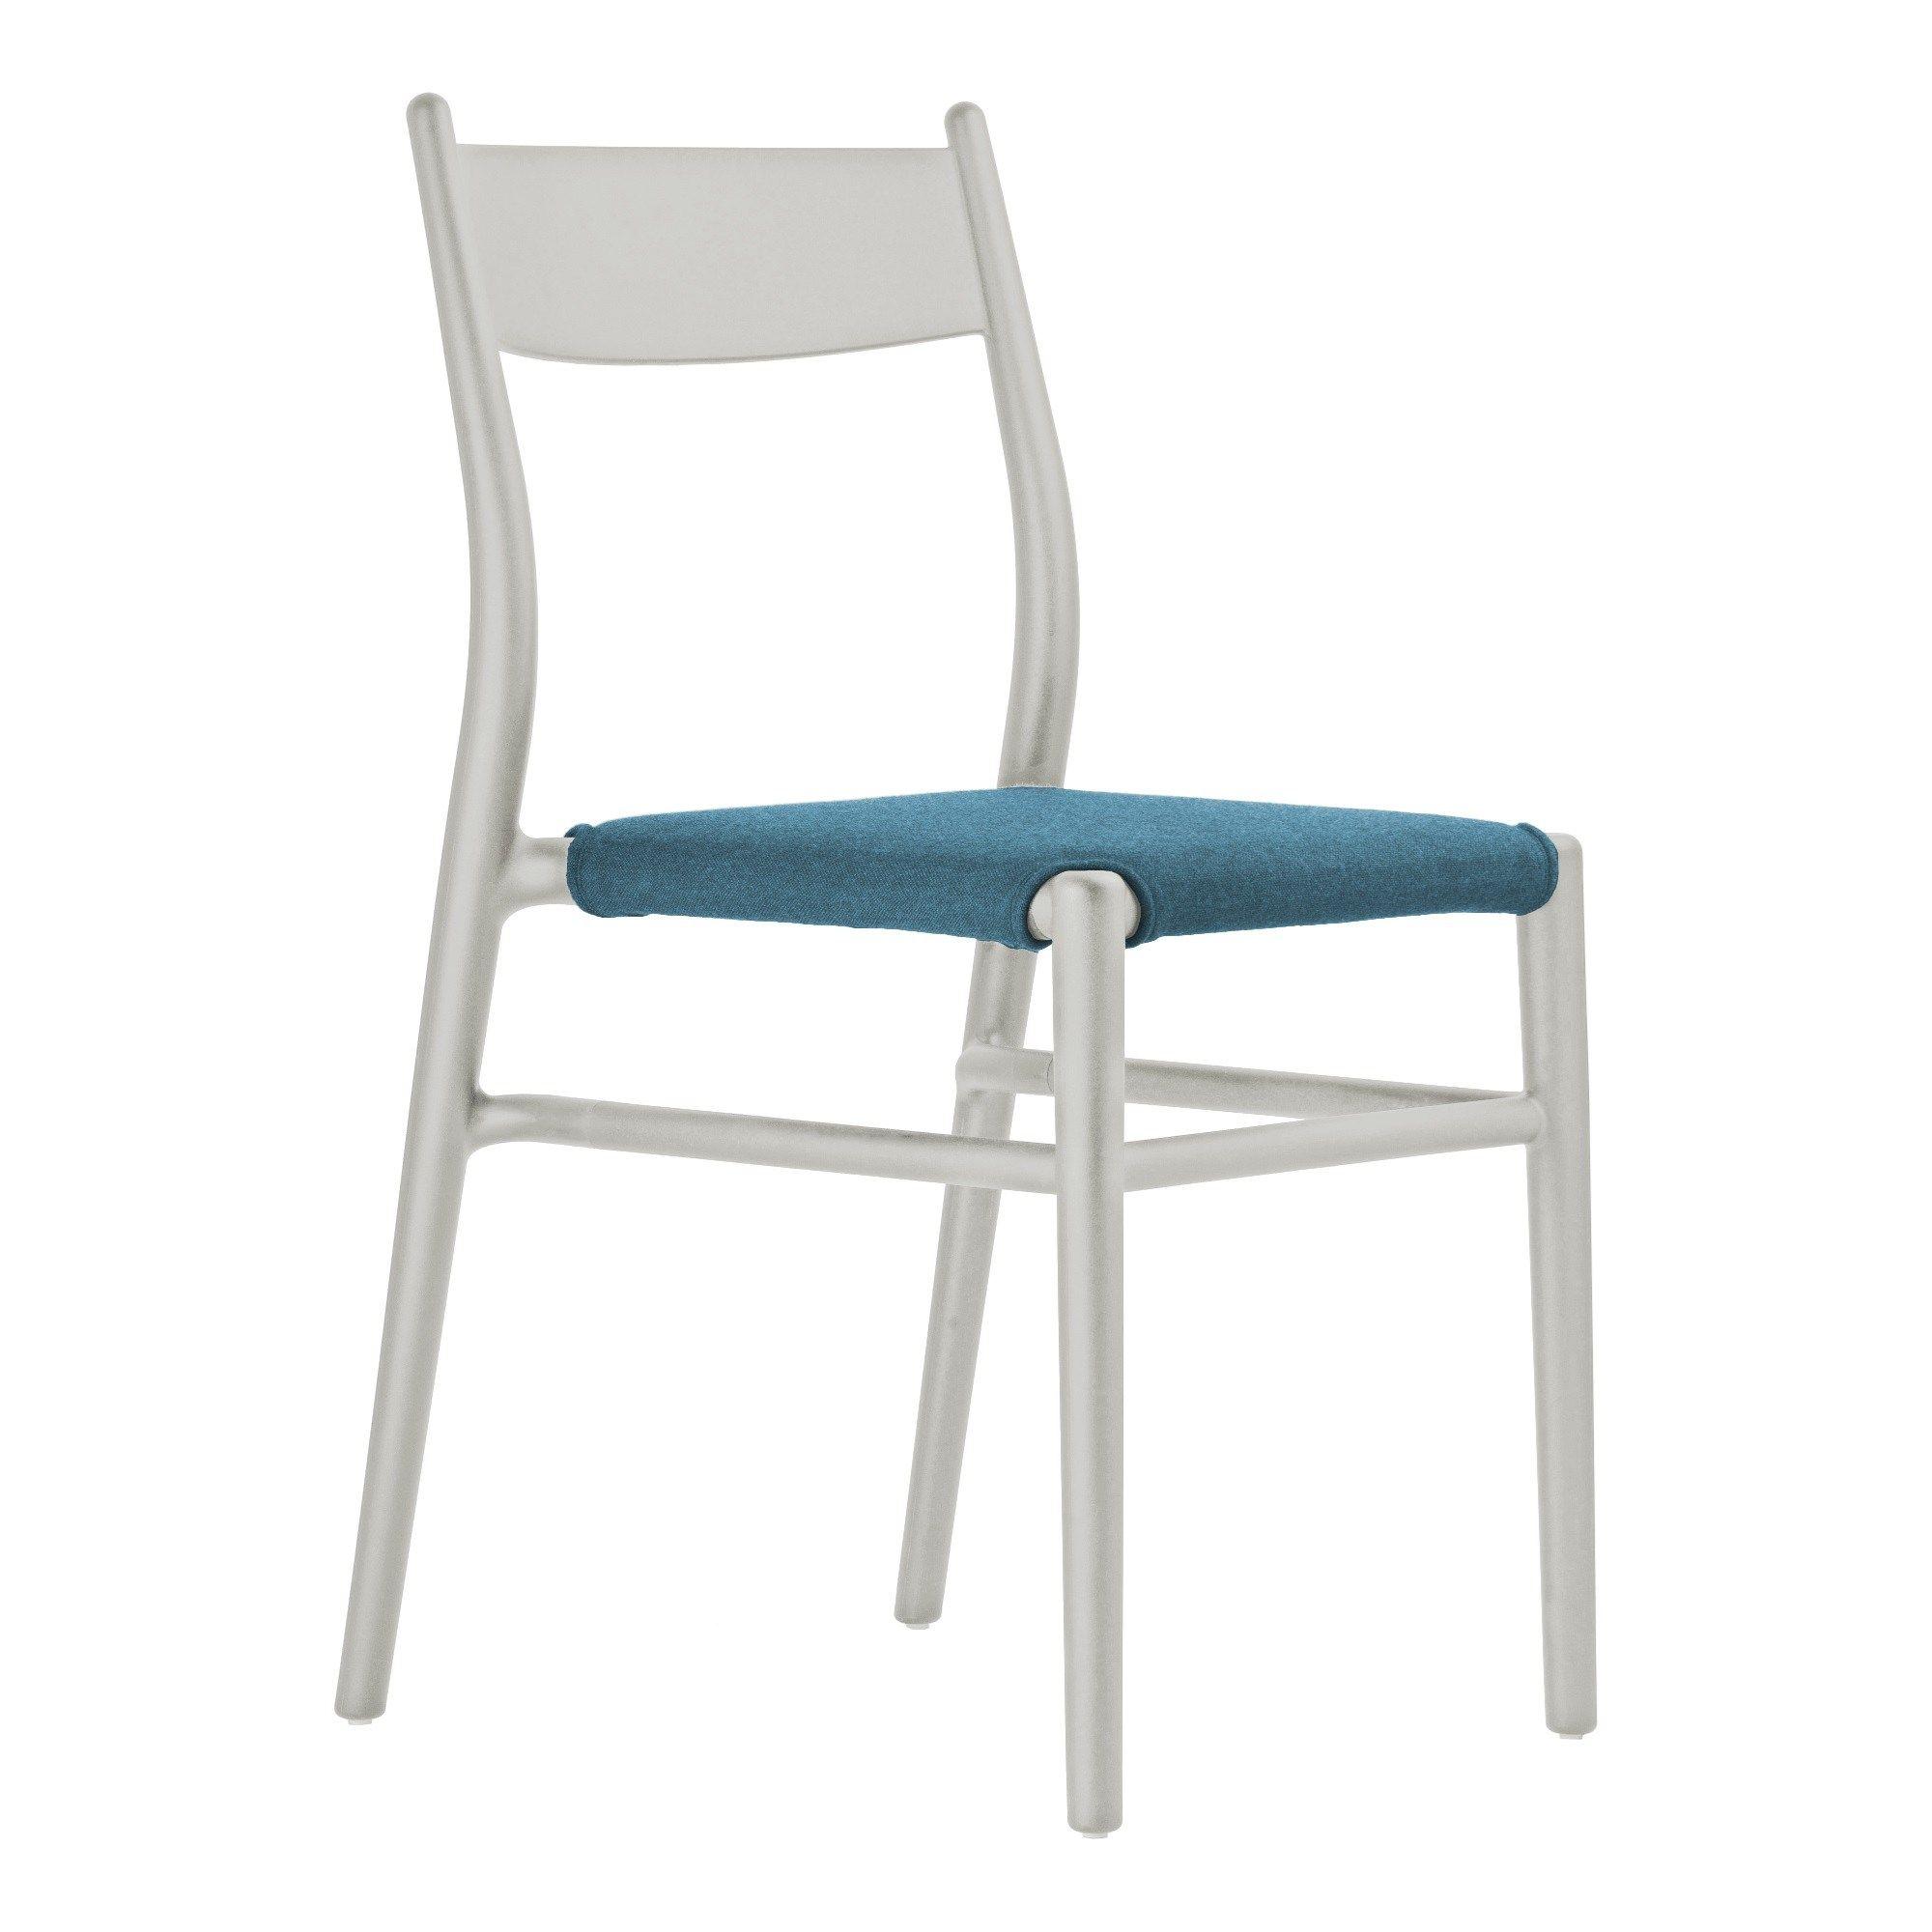 joi thirtysix gartenstuhl by kubikoff design simone viola. Black Bedroom Furniture Sets. Home Design Ideas